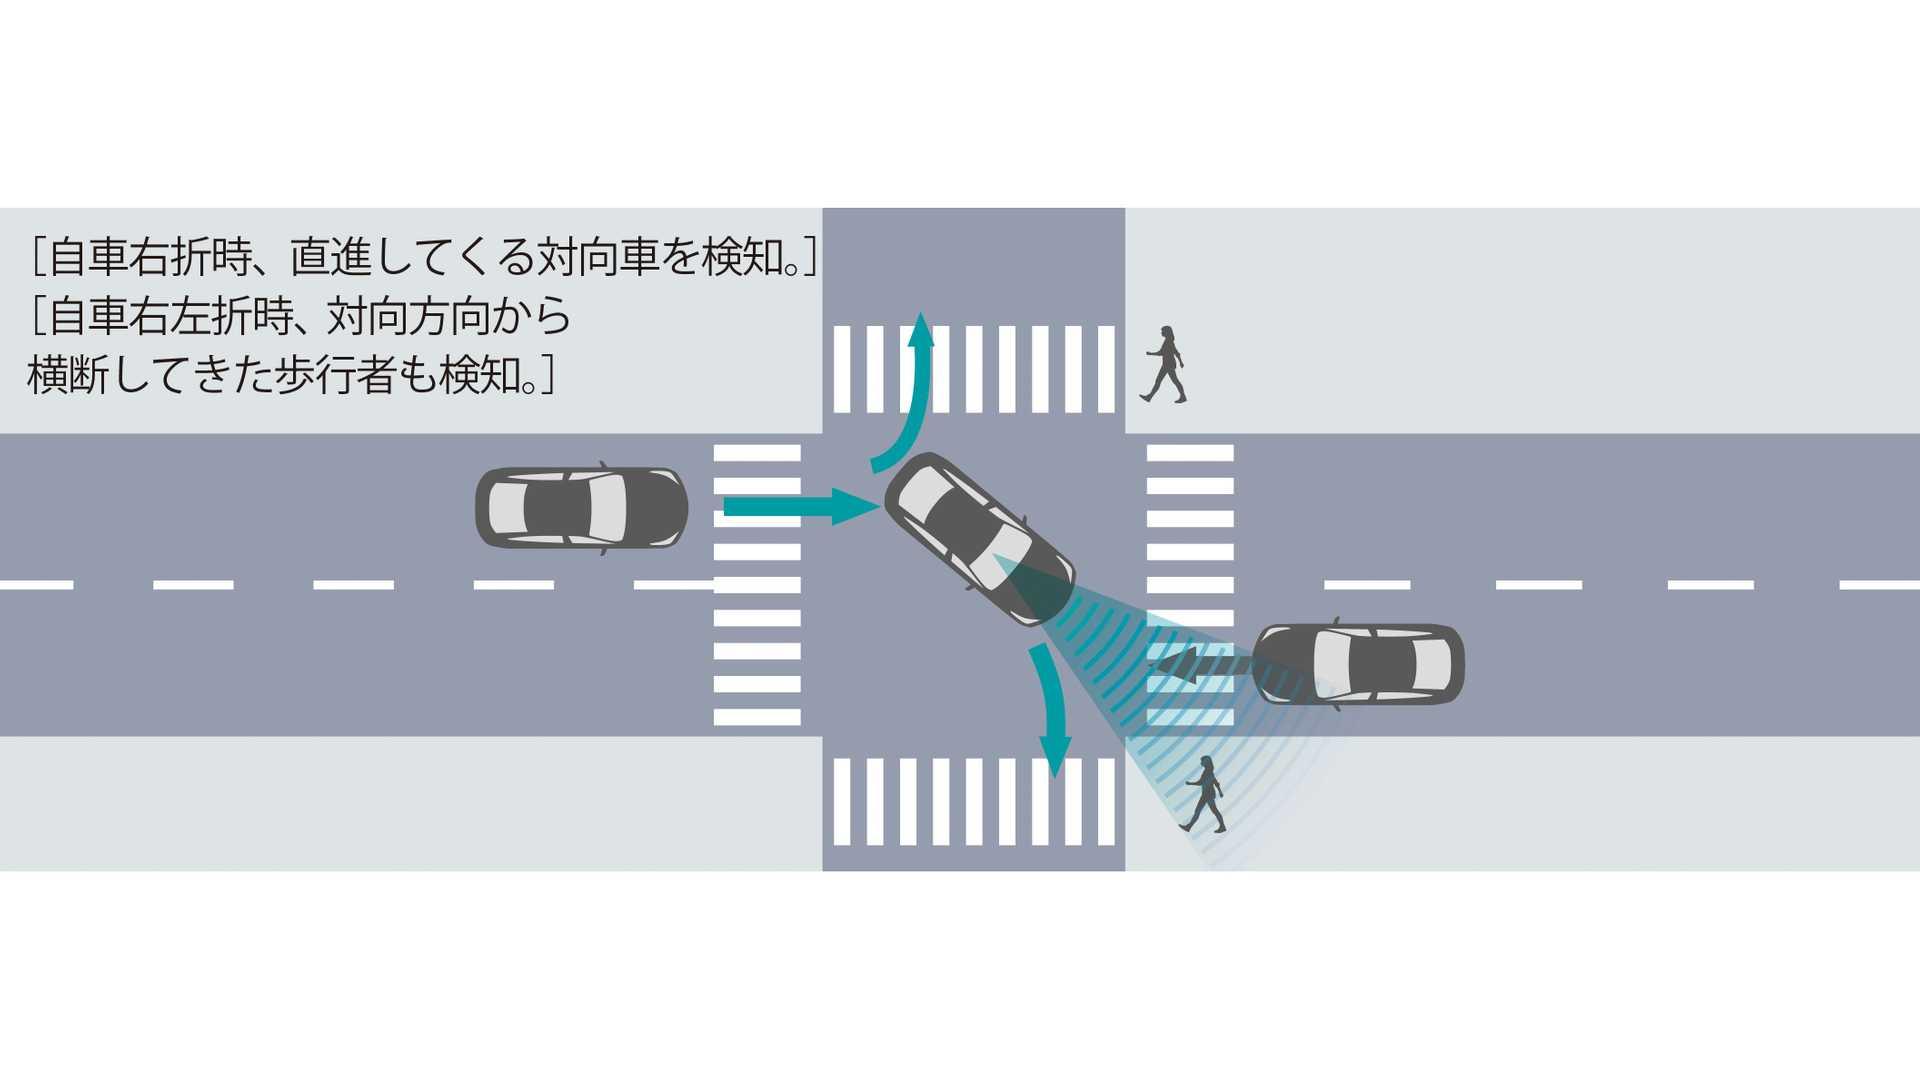 Lexus-LS-And-Toyota-Mirai-Advanced-Drive-40